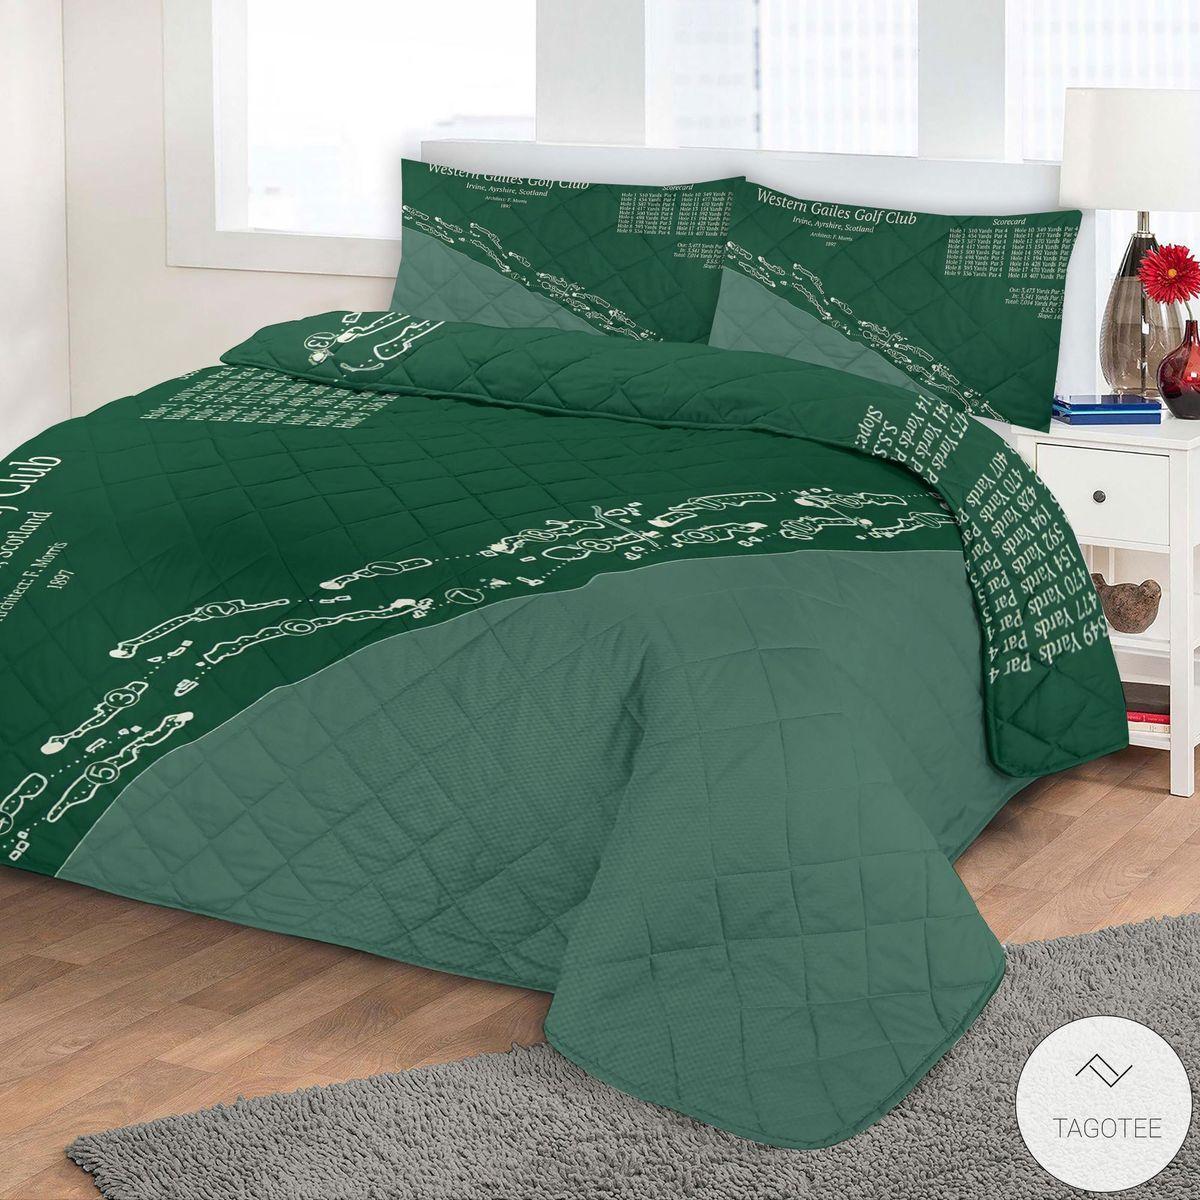 Western Gailes Golf Club Map 3D Quilt Bedding Setz